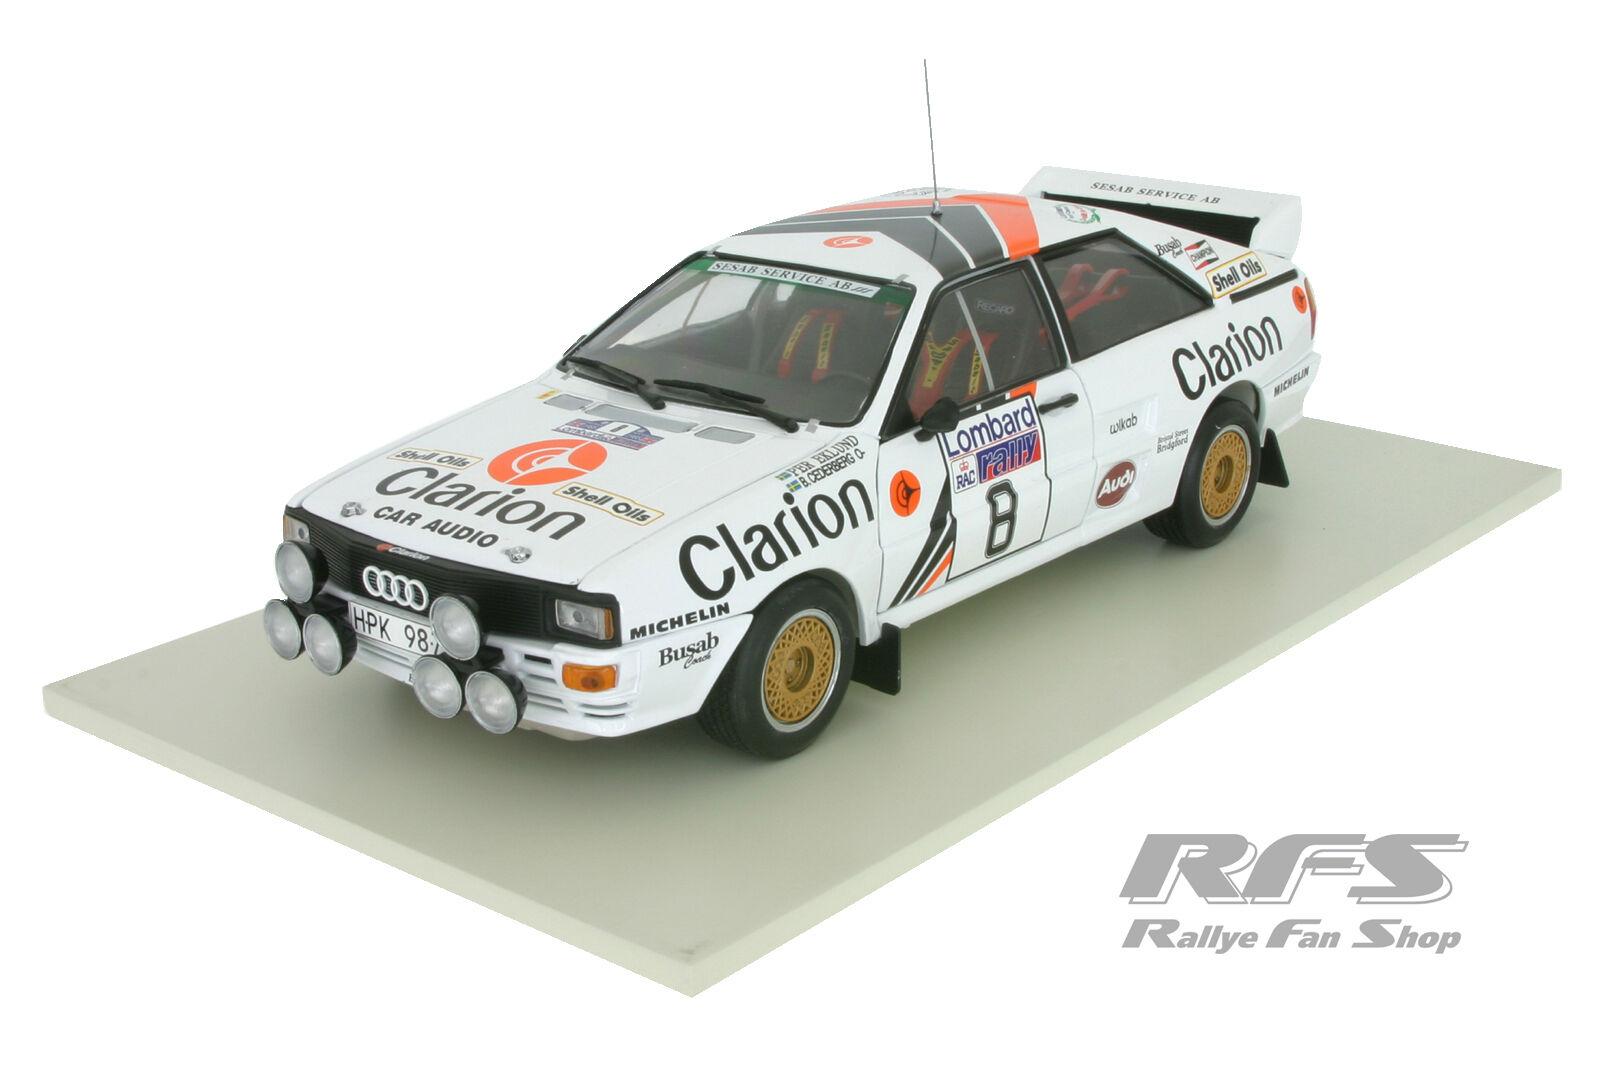 Audi Quattro A2 Team Team Team CLARION - Lombard RAC Rallye 1985 - Eklund - 1 18 SS 4242 1cae29